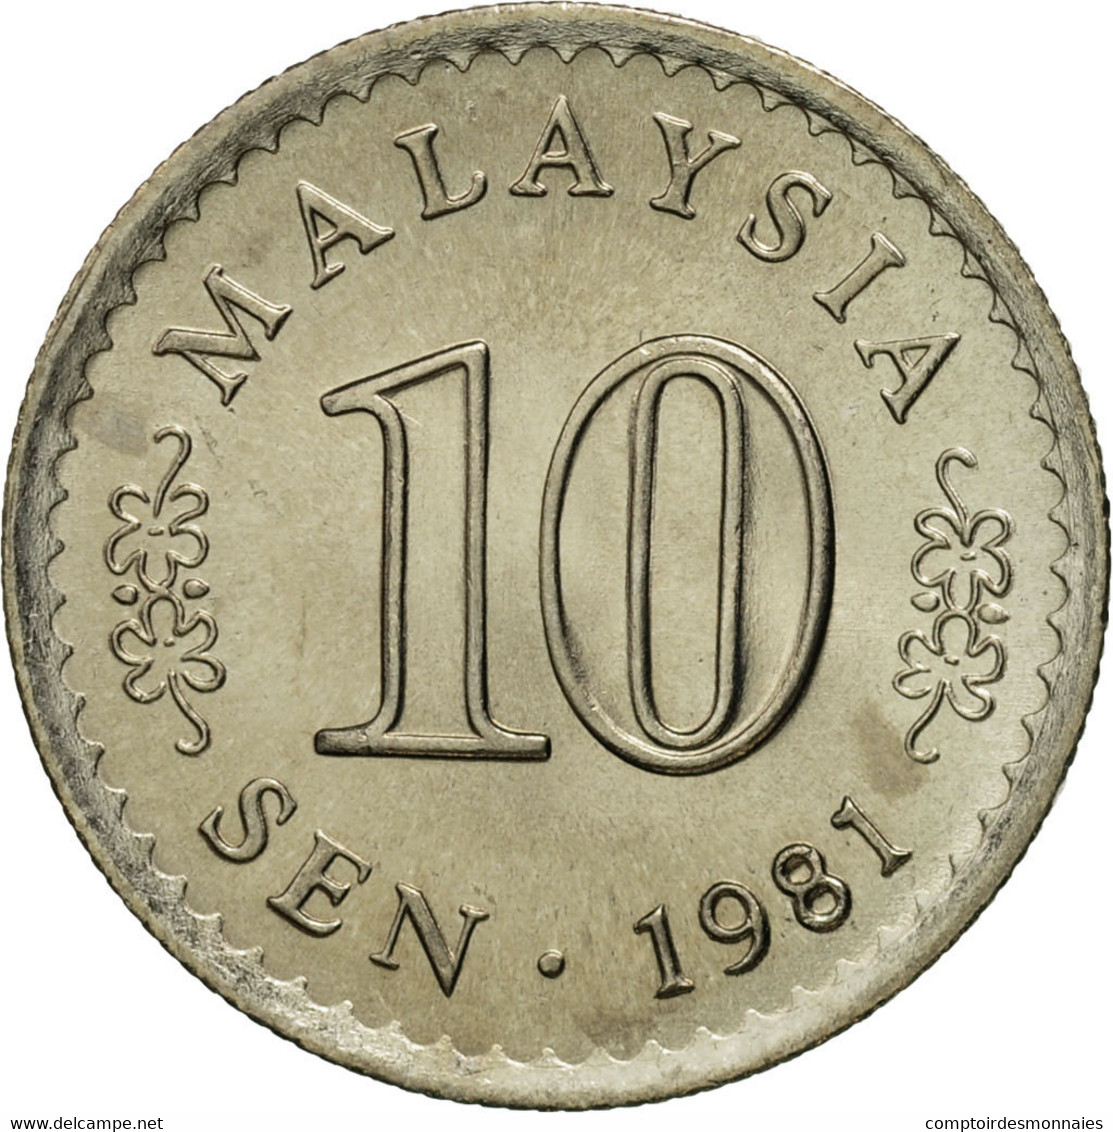 Malaysie, 10 Sen, 1981, Franklin Mint, FDC, Copper-nickel, KM:3 - Malaysie